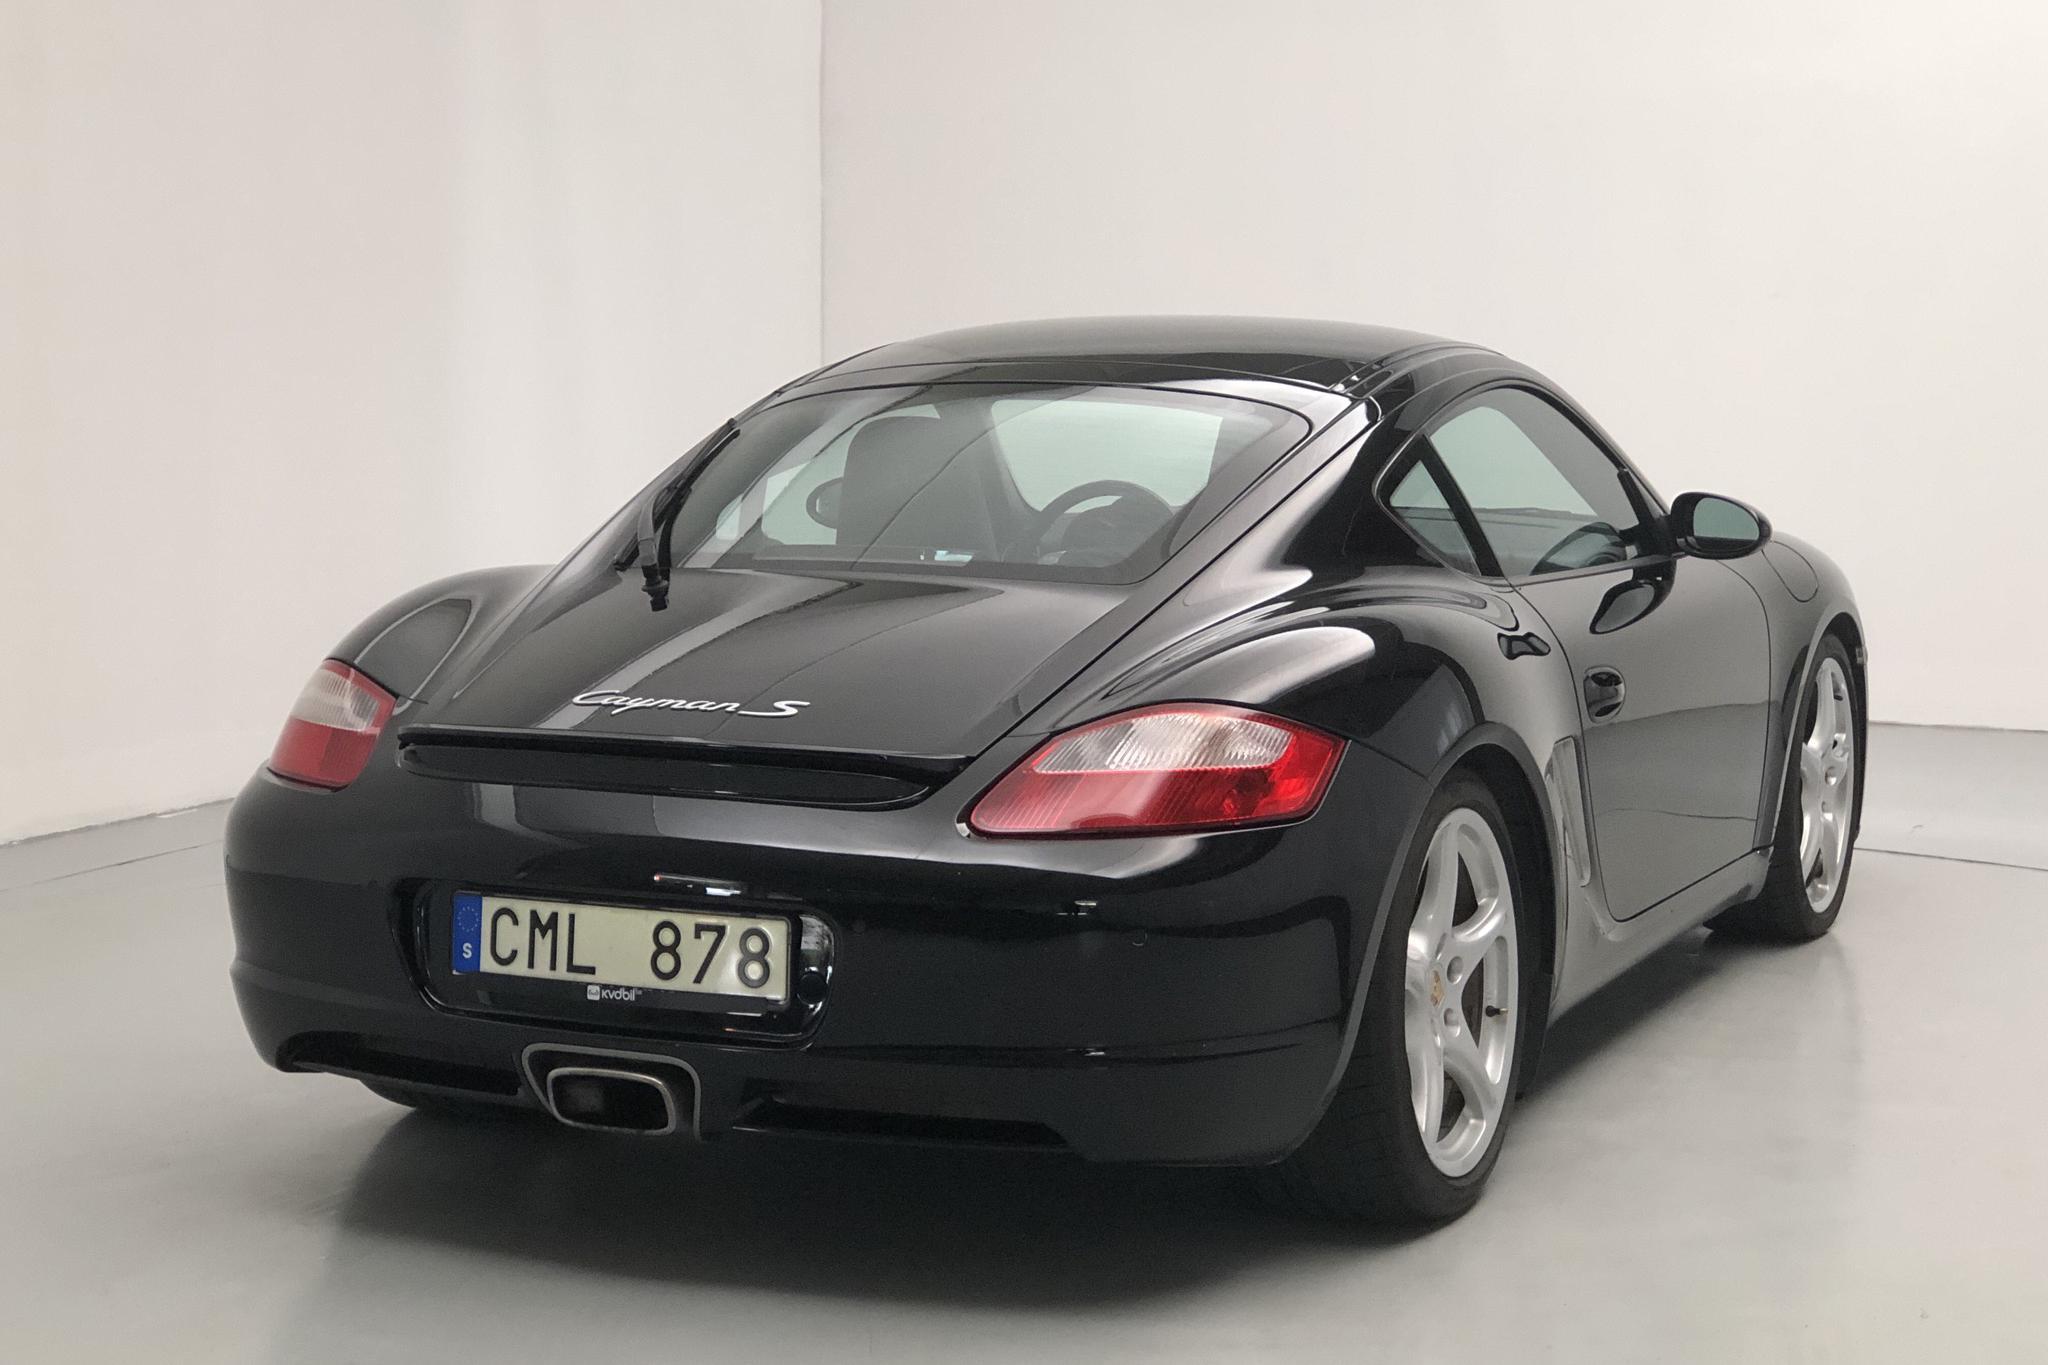 Porsche Cayman 3.4 S (295hk) - 127 360 km - Automatic - black - 2006